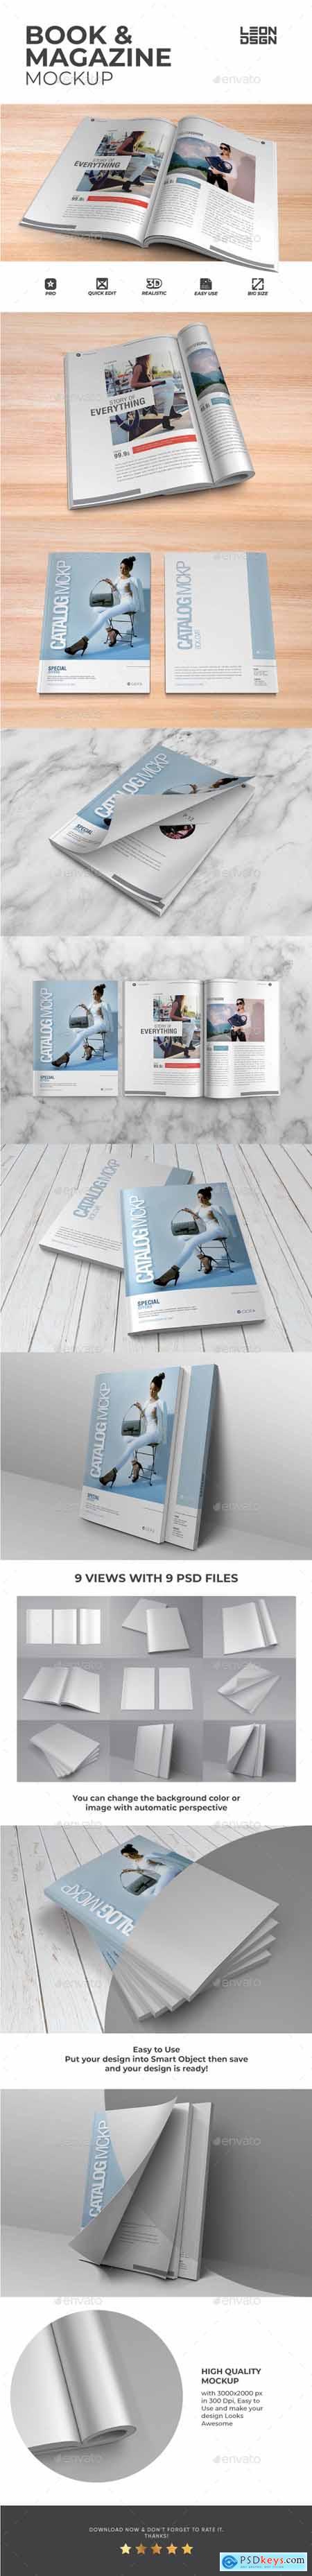 Book & Magazine Mockup 23768183